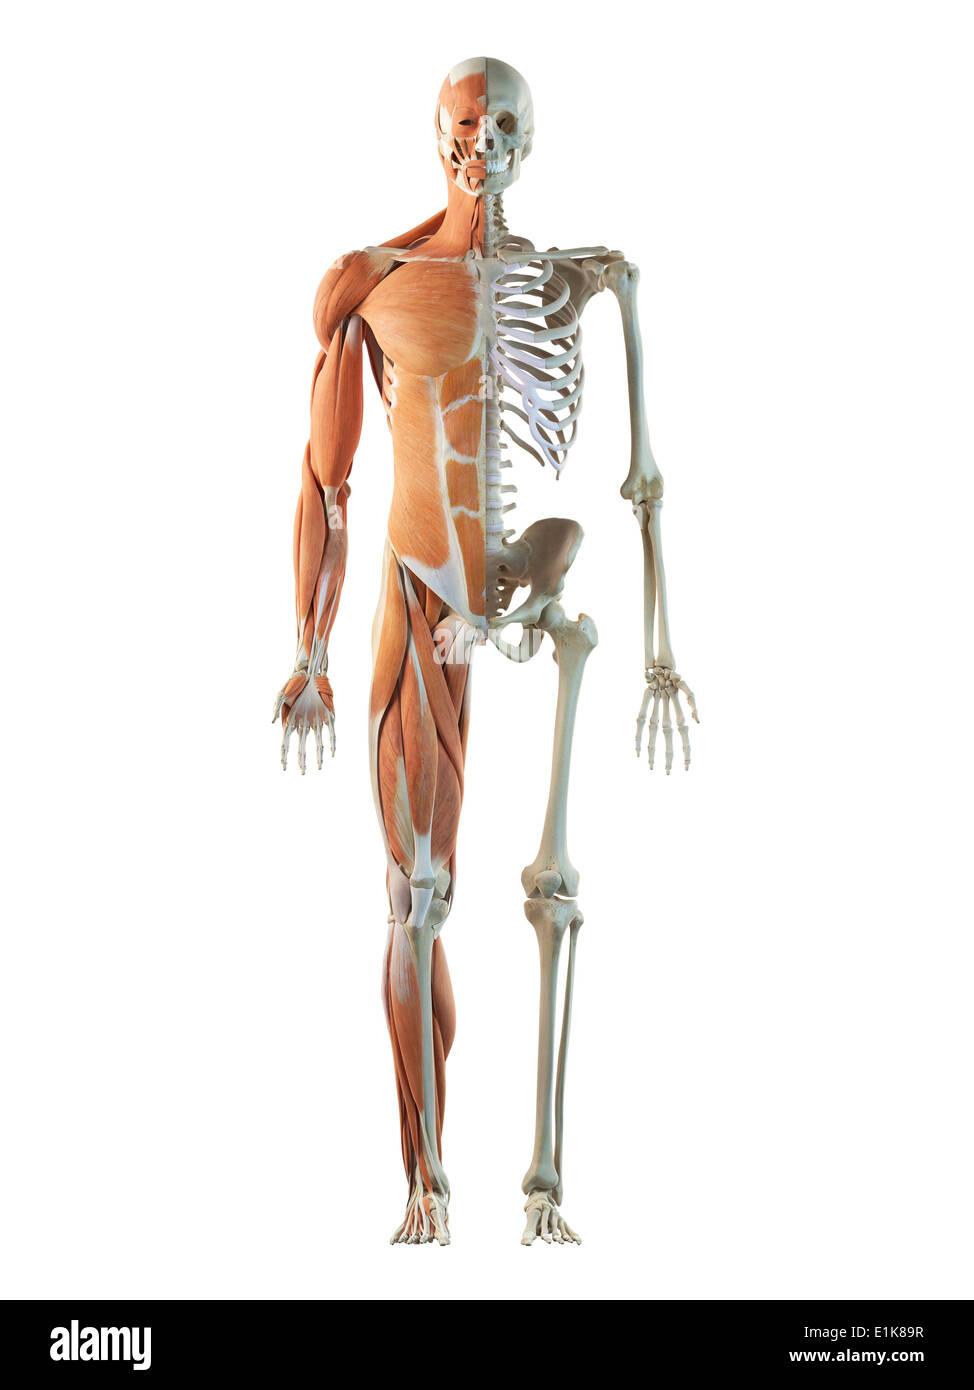 human musculoskeletal system cut away computer artwork